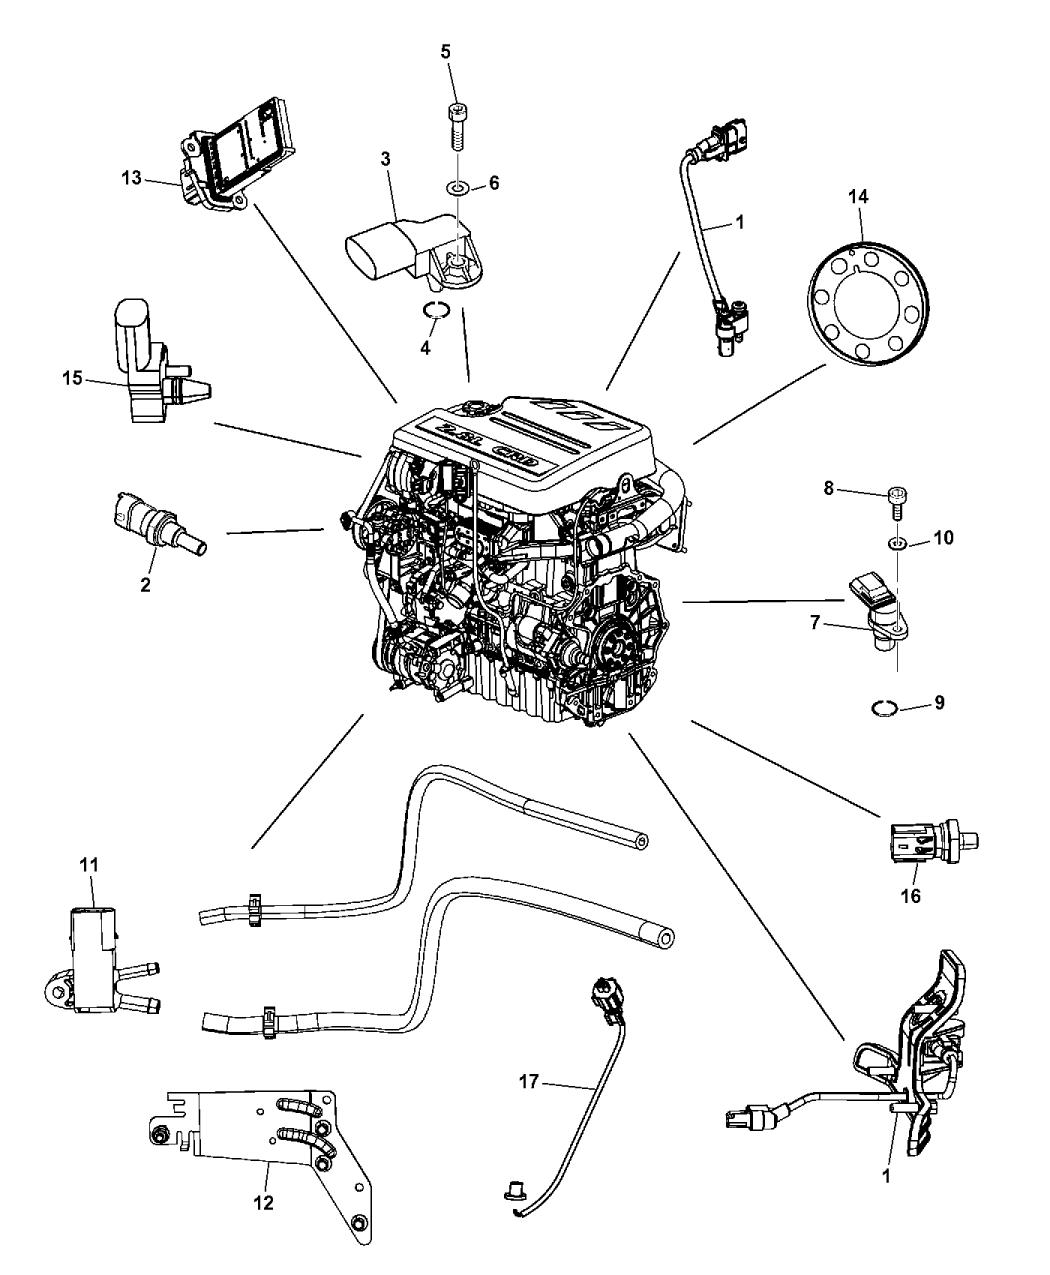 2014 Dodge Grand Caravan Sensors Mopar Parts Giant Wiring Diagram